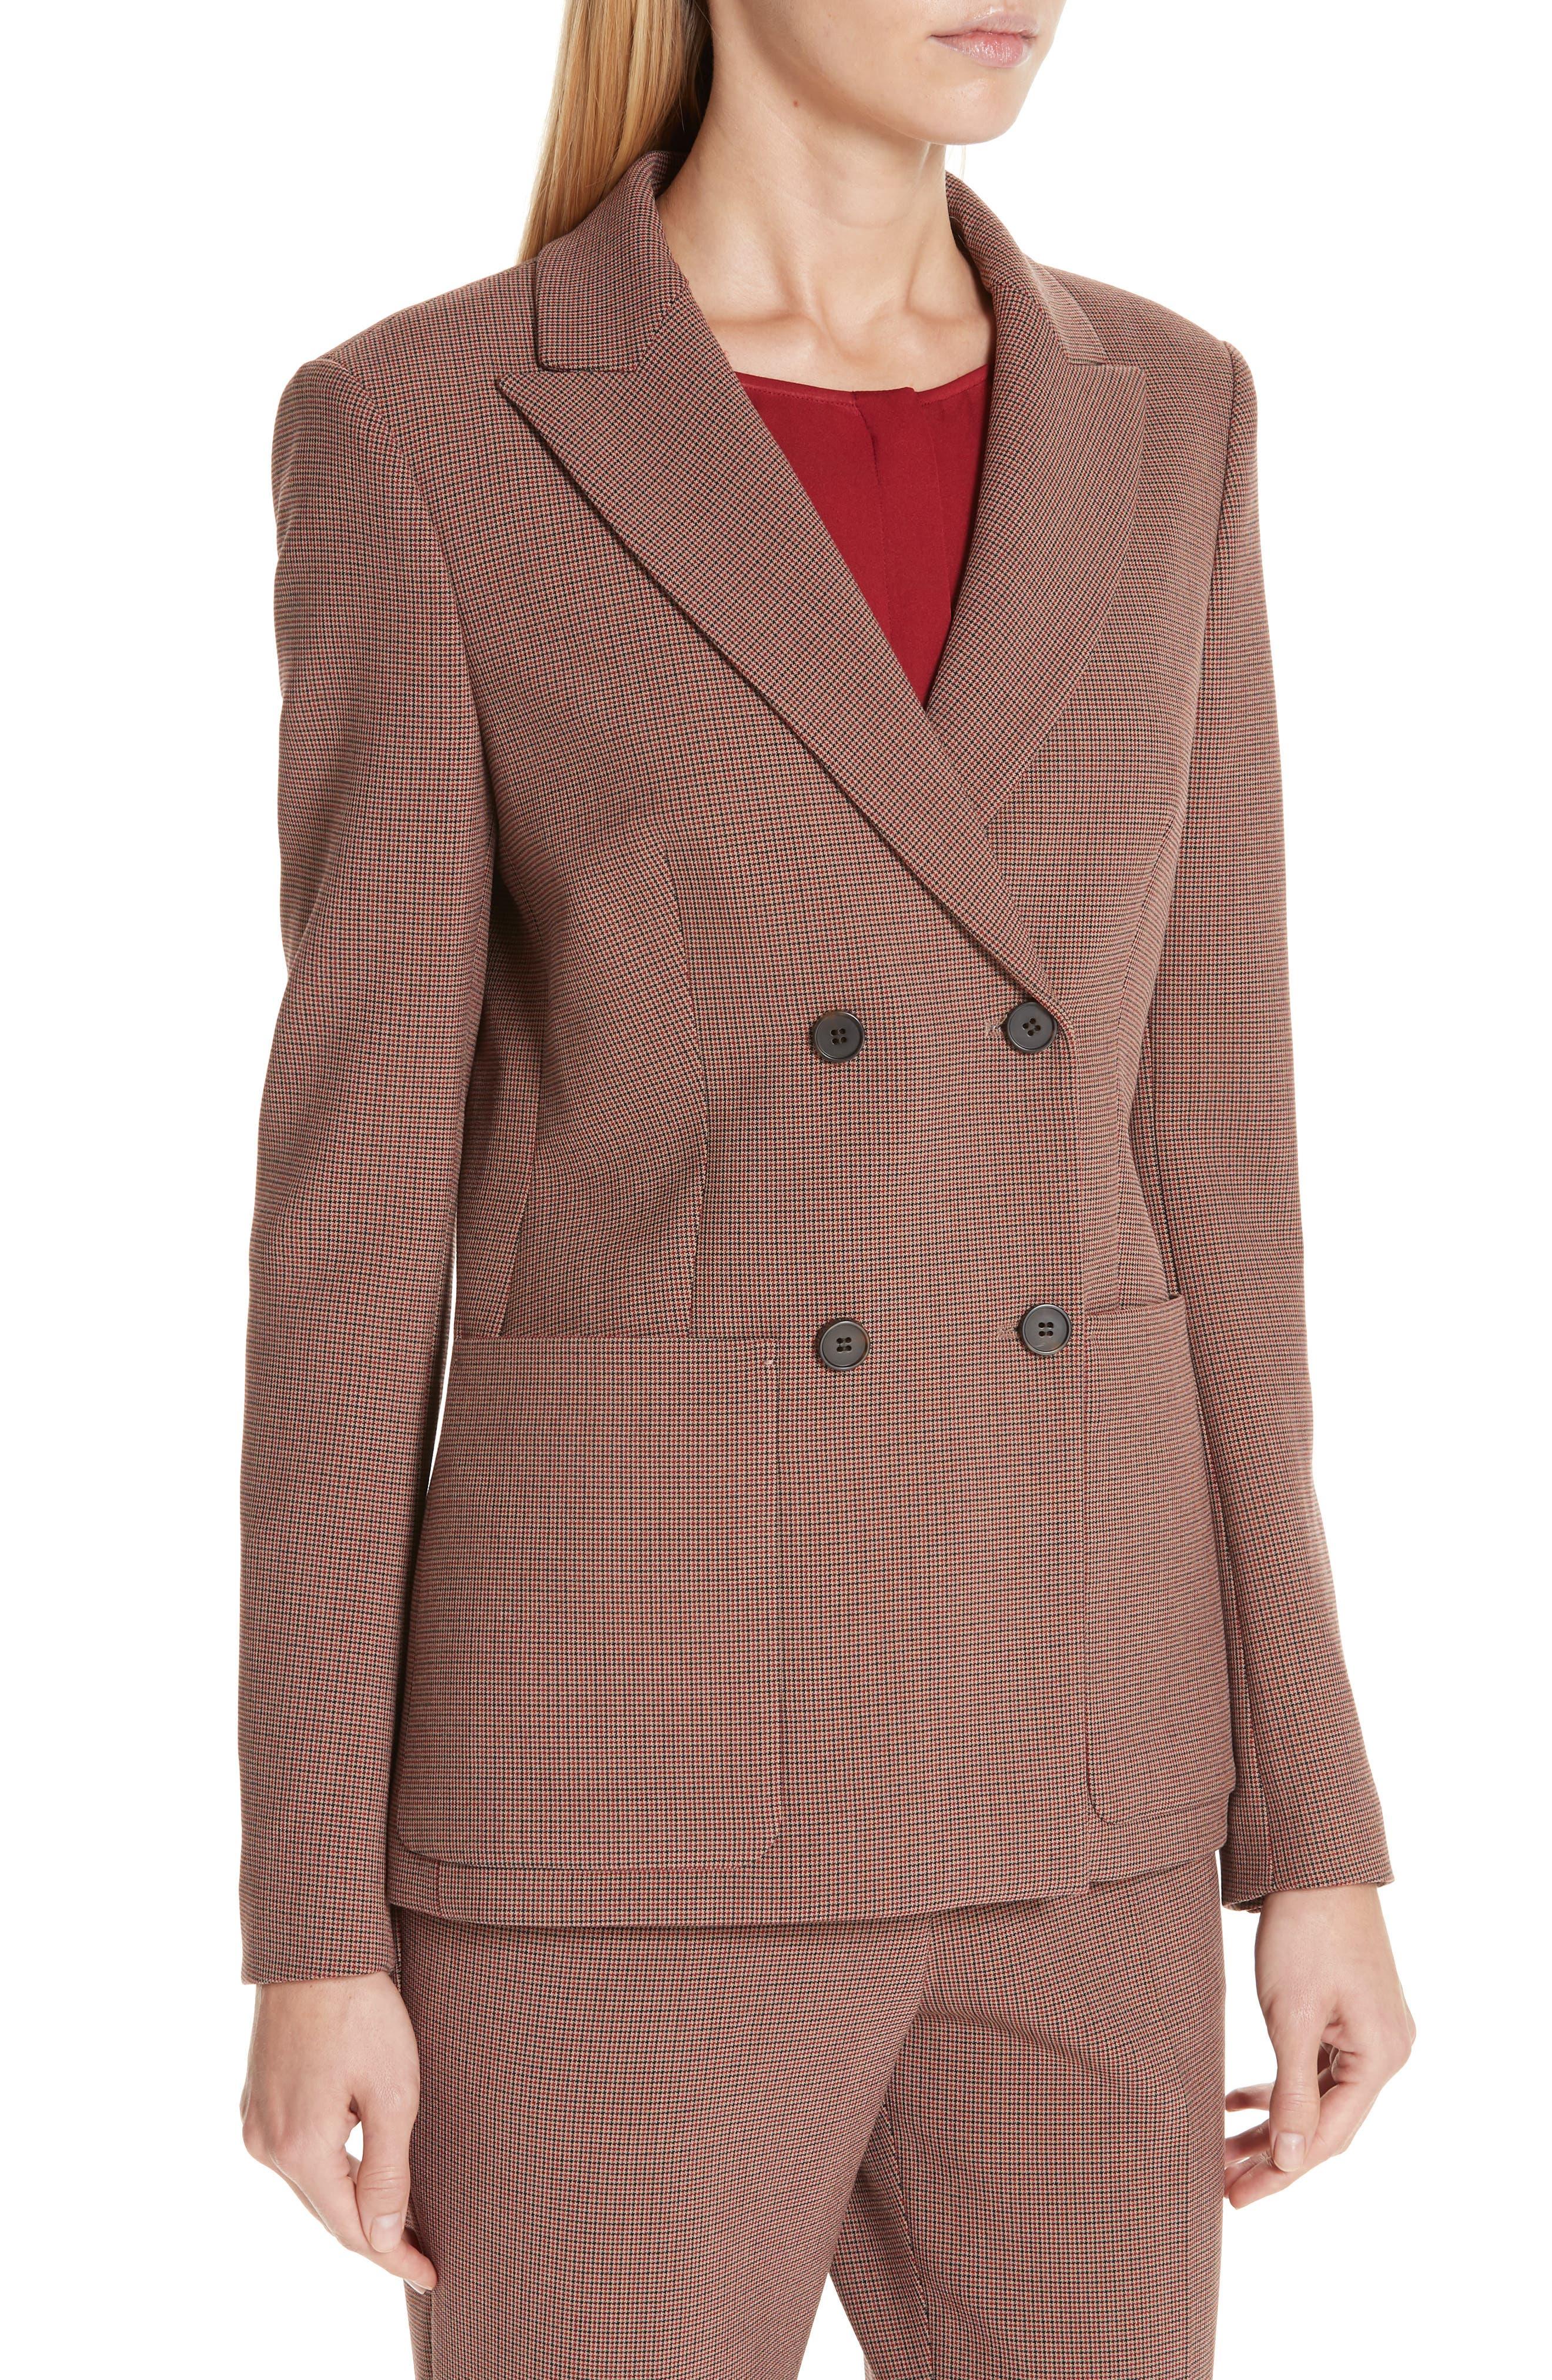 Joliviena Check Suit Jacket,                             Alternate thumbnail 4, color,                             DARK RED CHECK